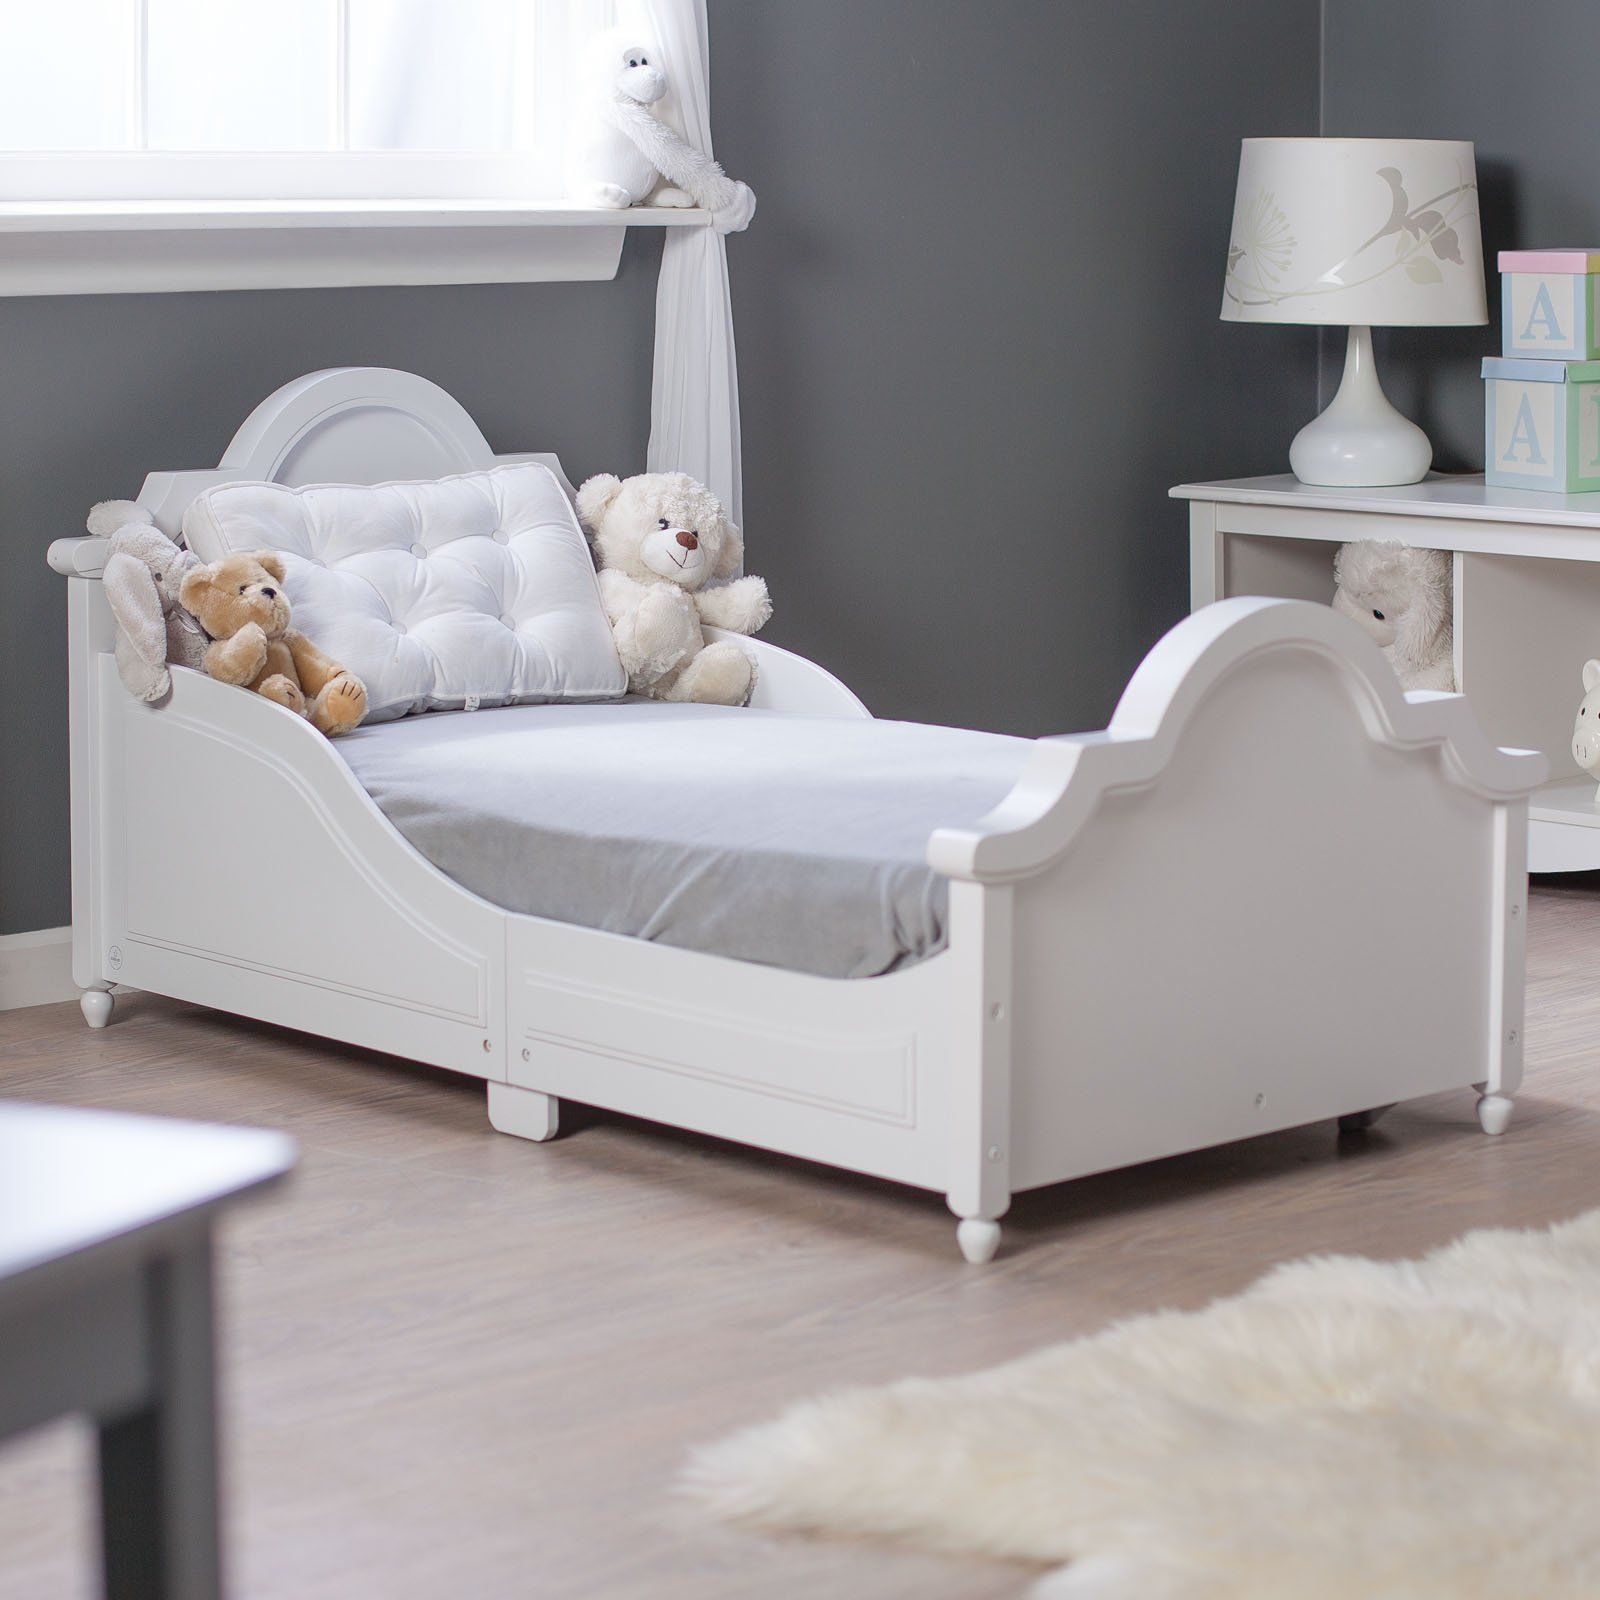 kidkraft raleigh toddler bed white 161 28 lit enfant fille chambre